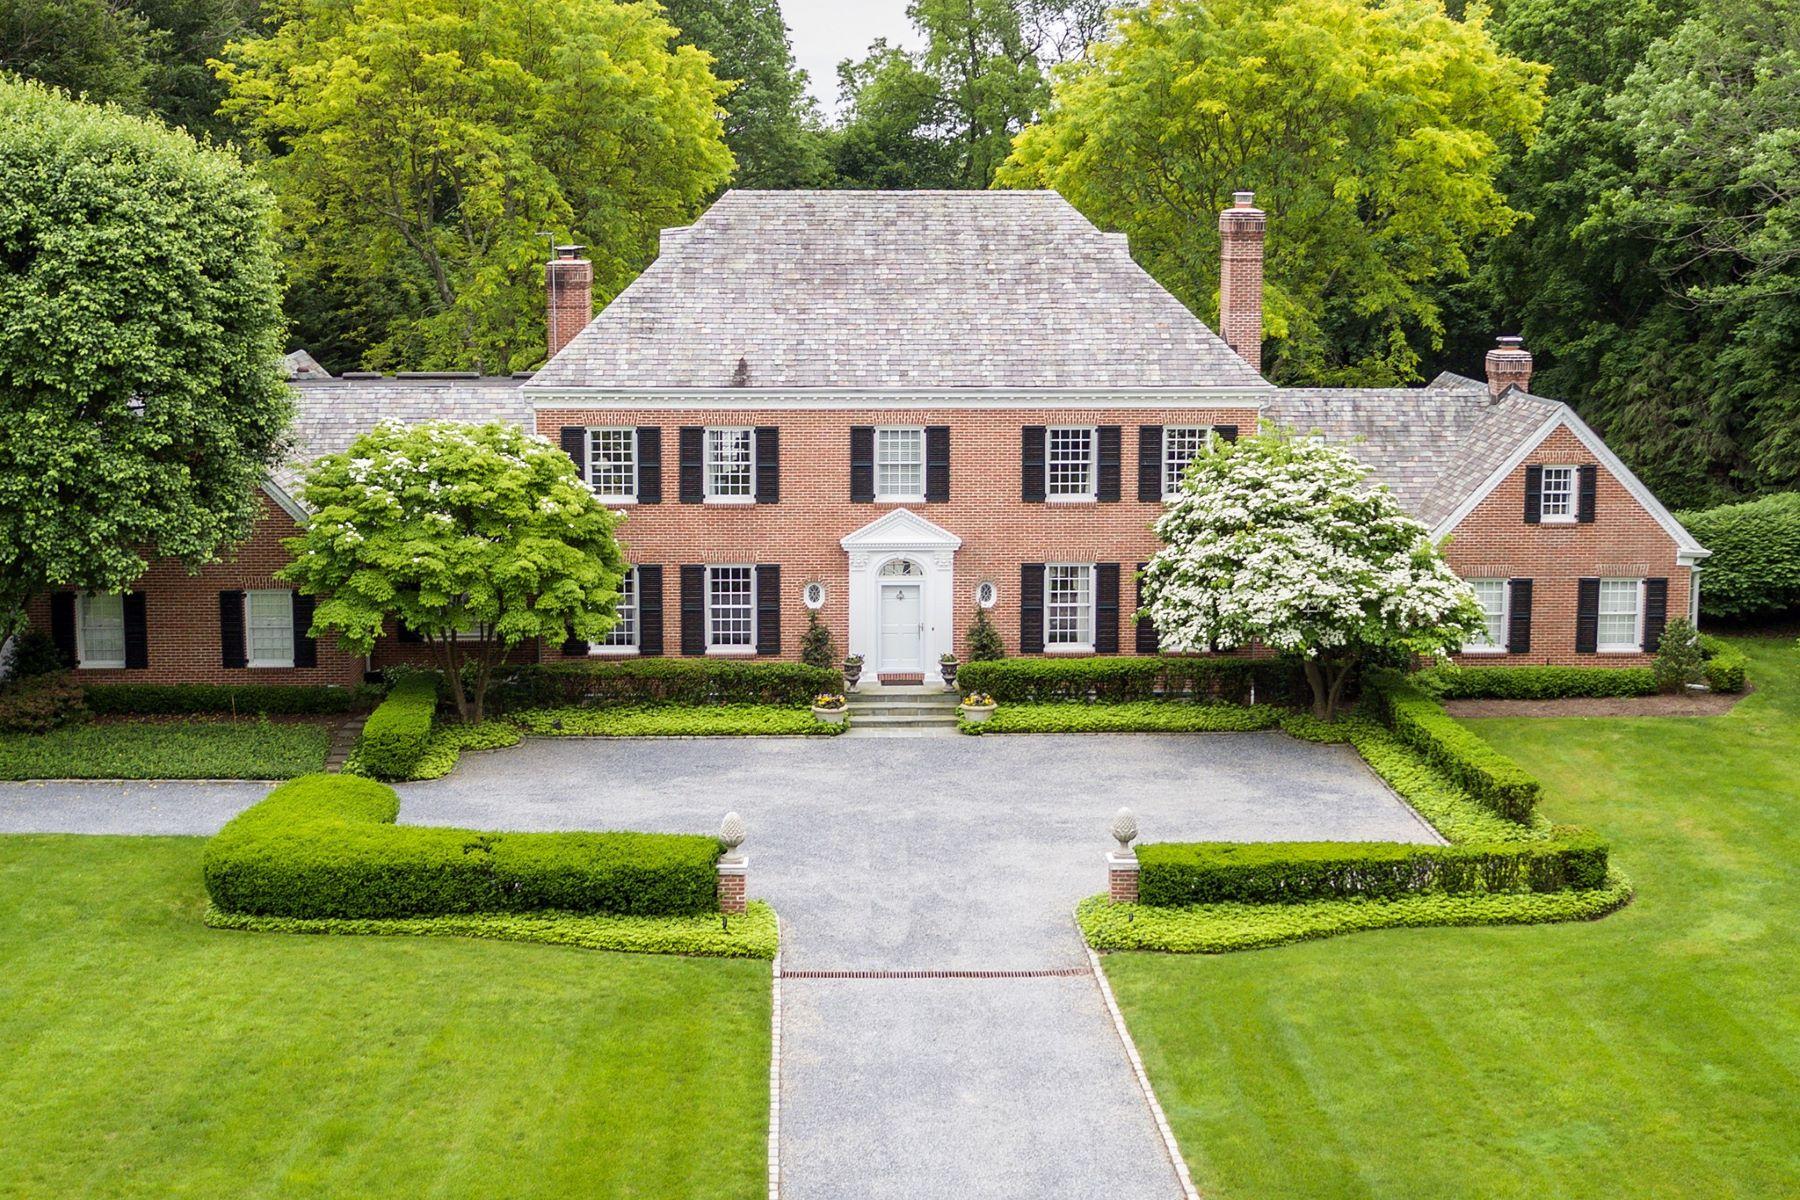 獨棟家庭住宅 為 出售 在 310 Feeks , Mill Neck, NY 11765 310 Feeks, Mill Neck, 紐約州, 11765 美國